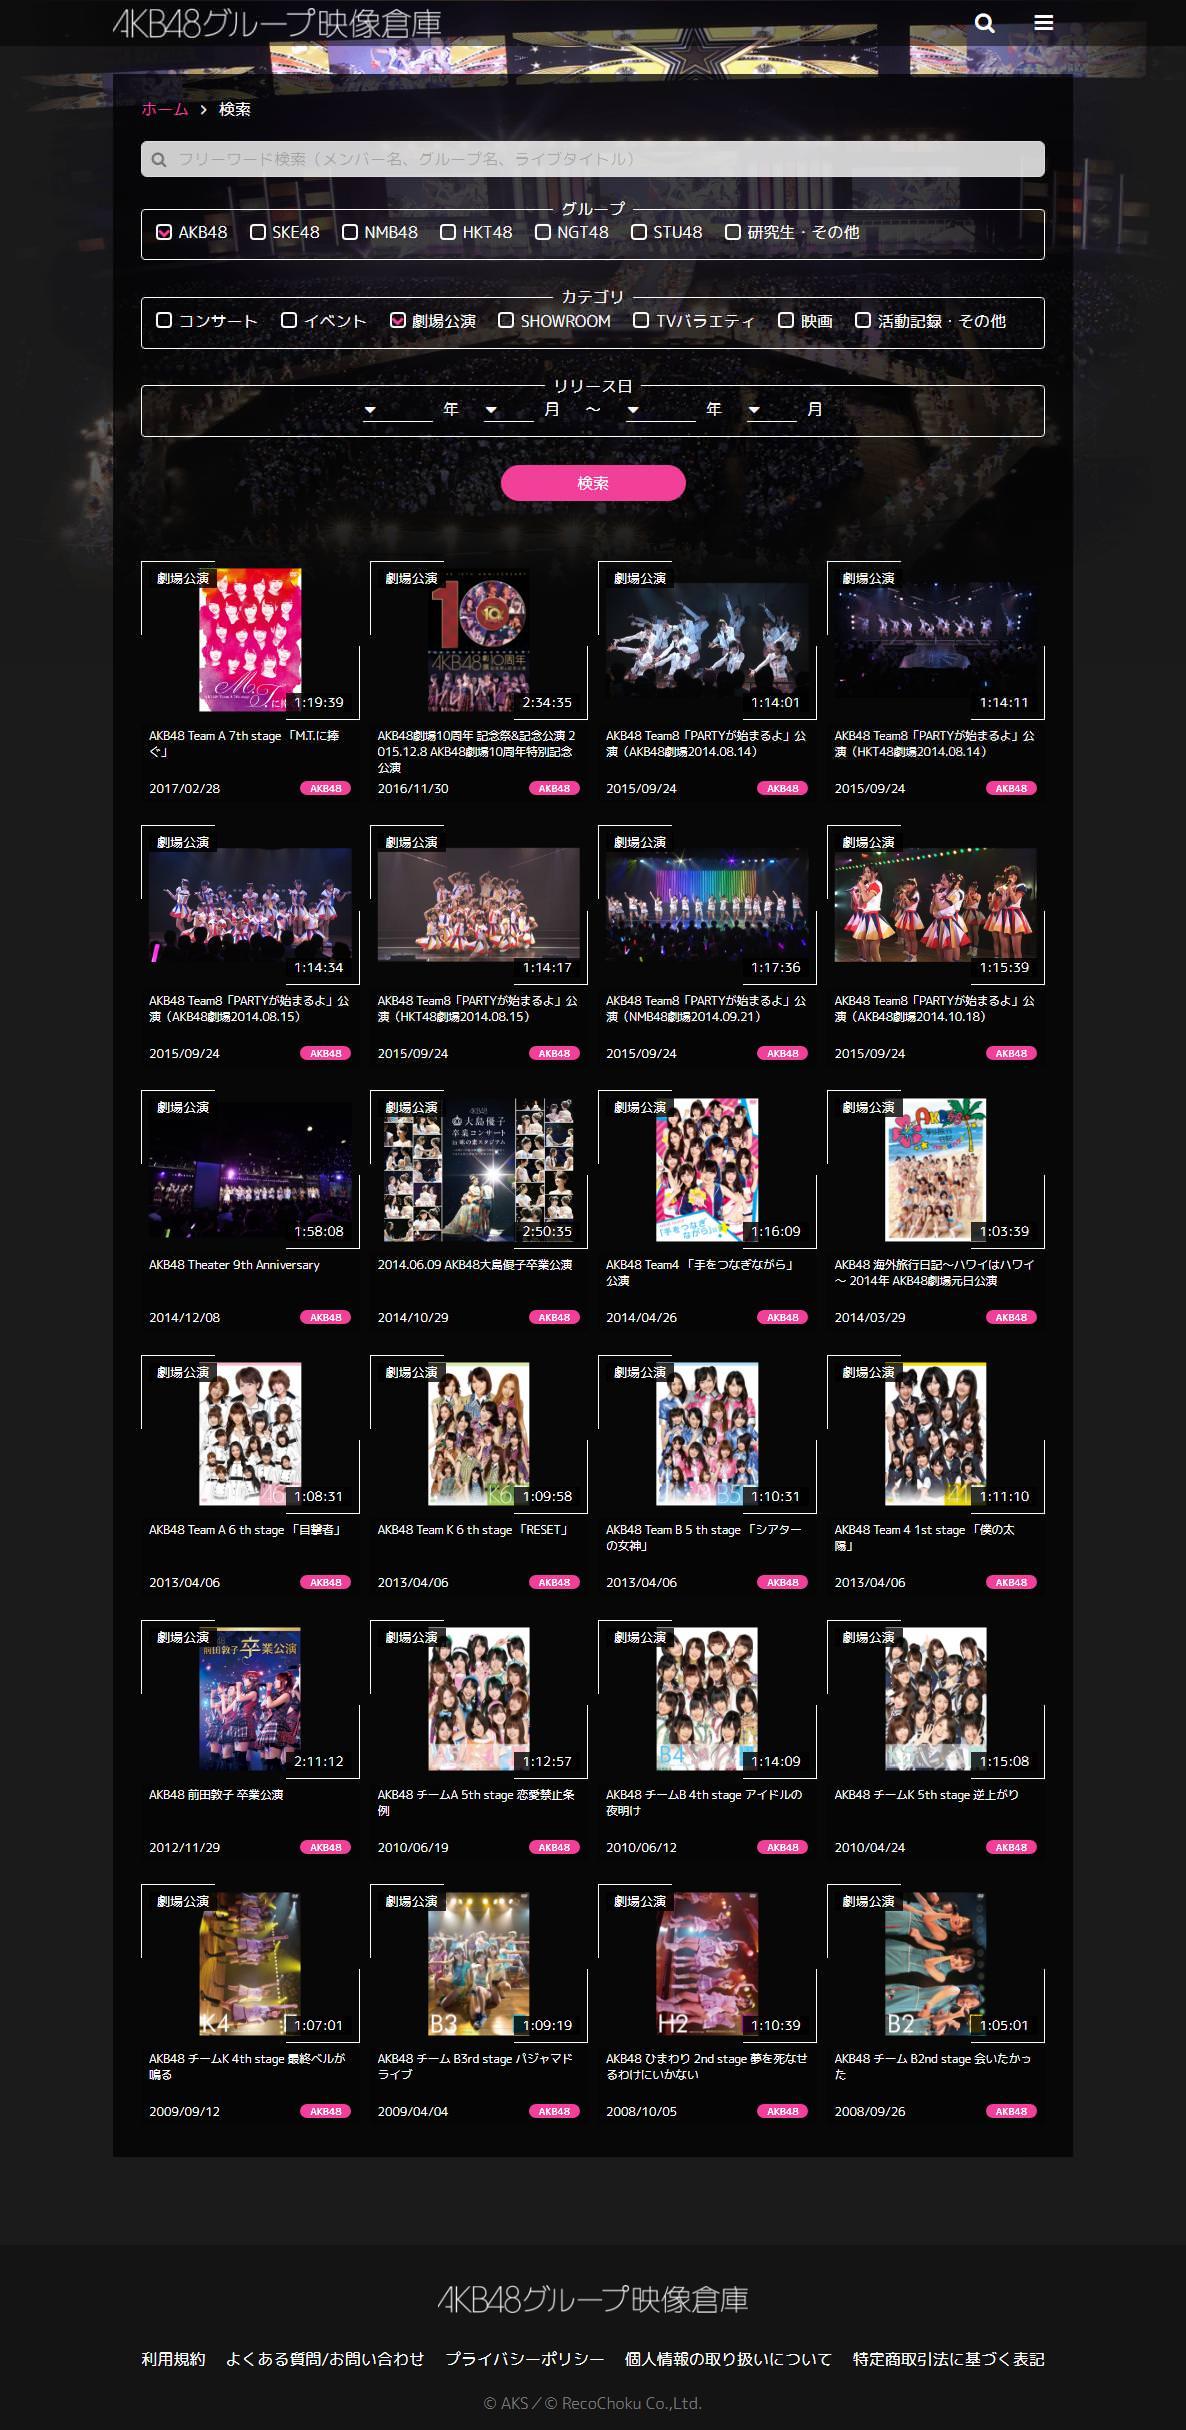 AKB48グループ映像倉庫・サービス開始『コンサート・TV番組・公演・SHOWROOM』など